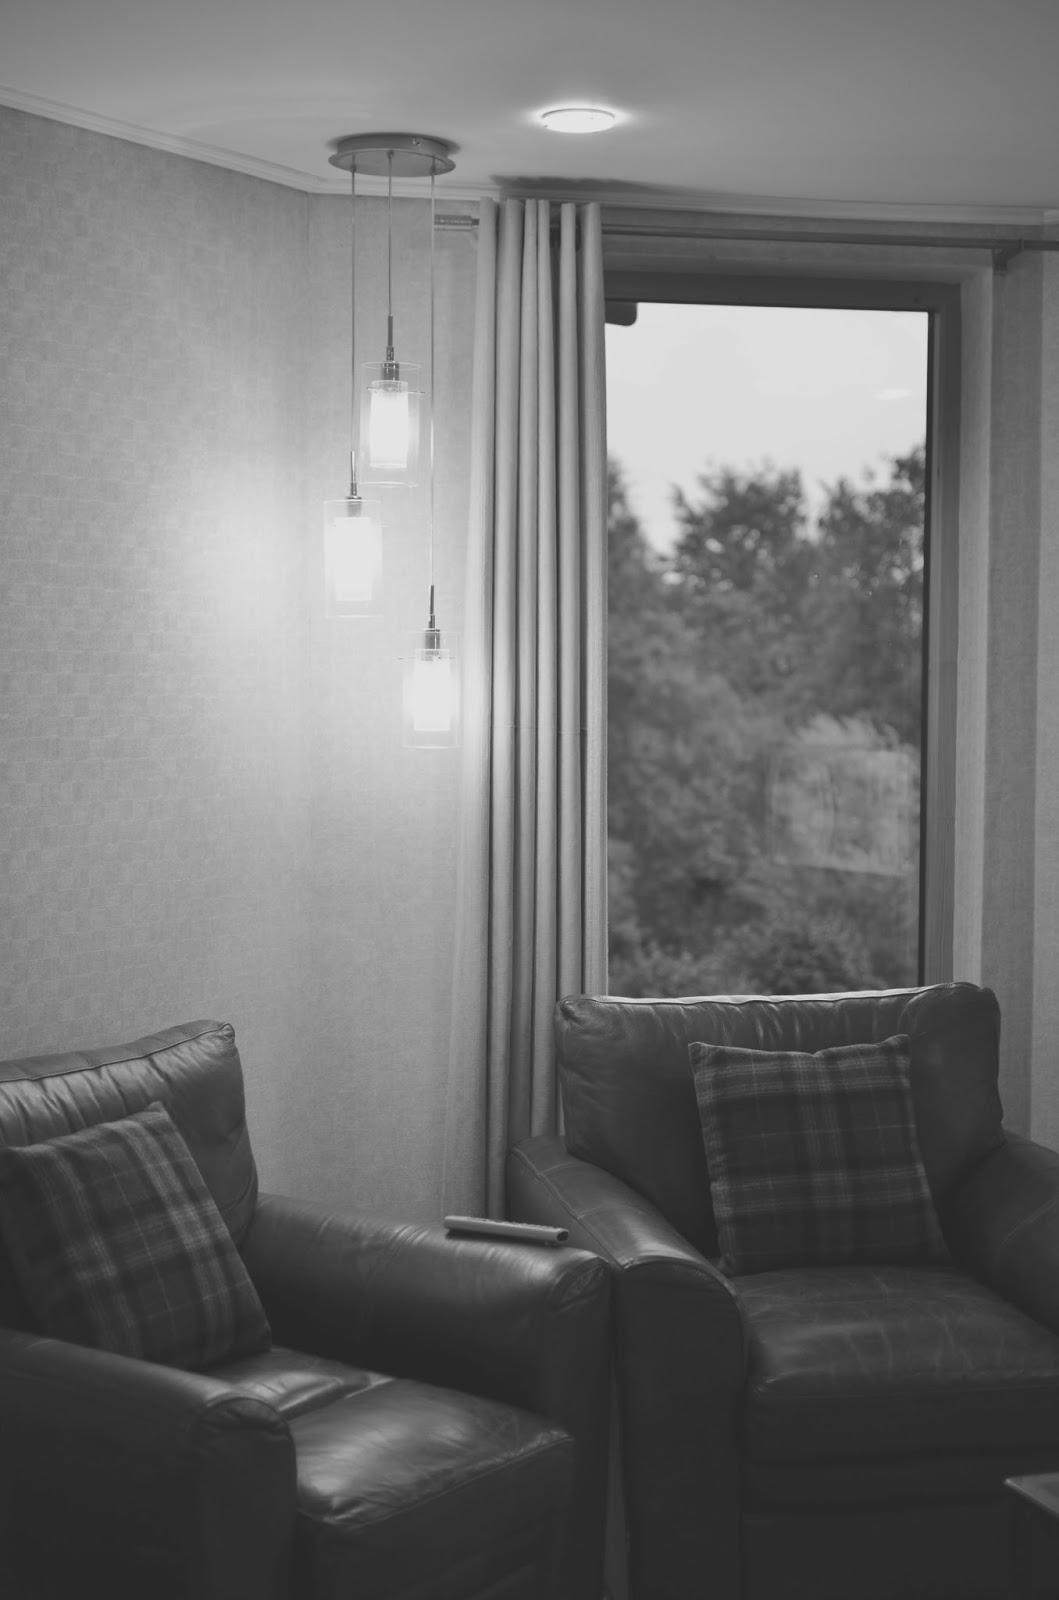 loch lomond, lodge on the loch munros room, scotland, scottish hotel, review,